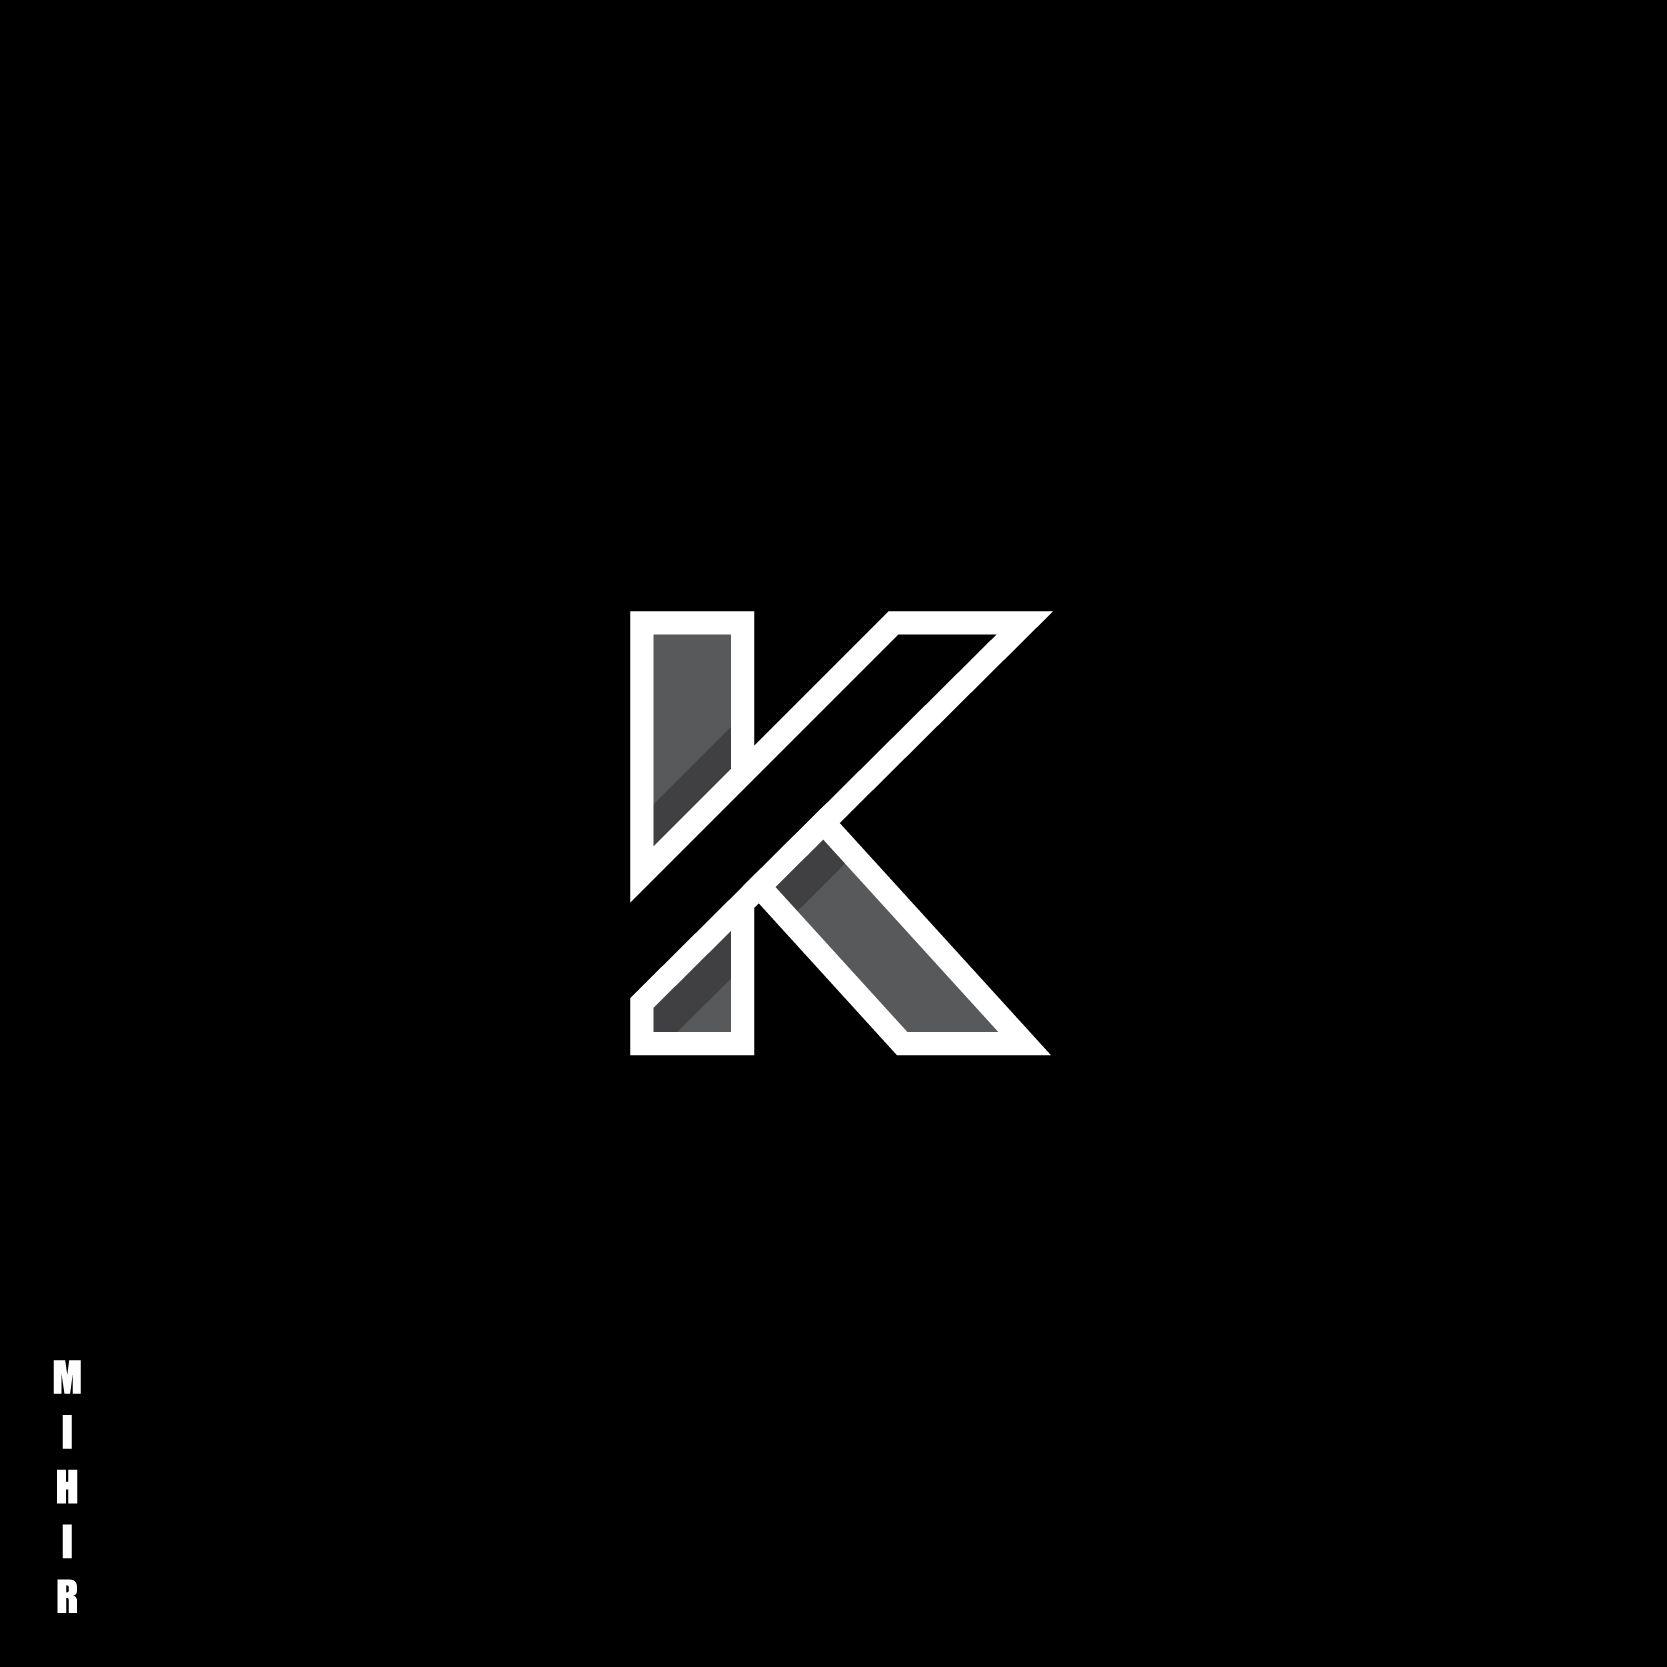 K Letter Logo Design Text Logo Design Letter Logo Design Online Logo Design Letter k k logo design hd